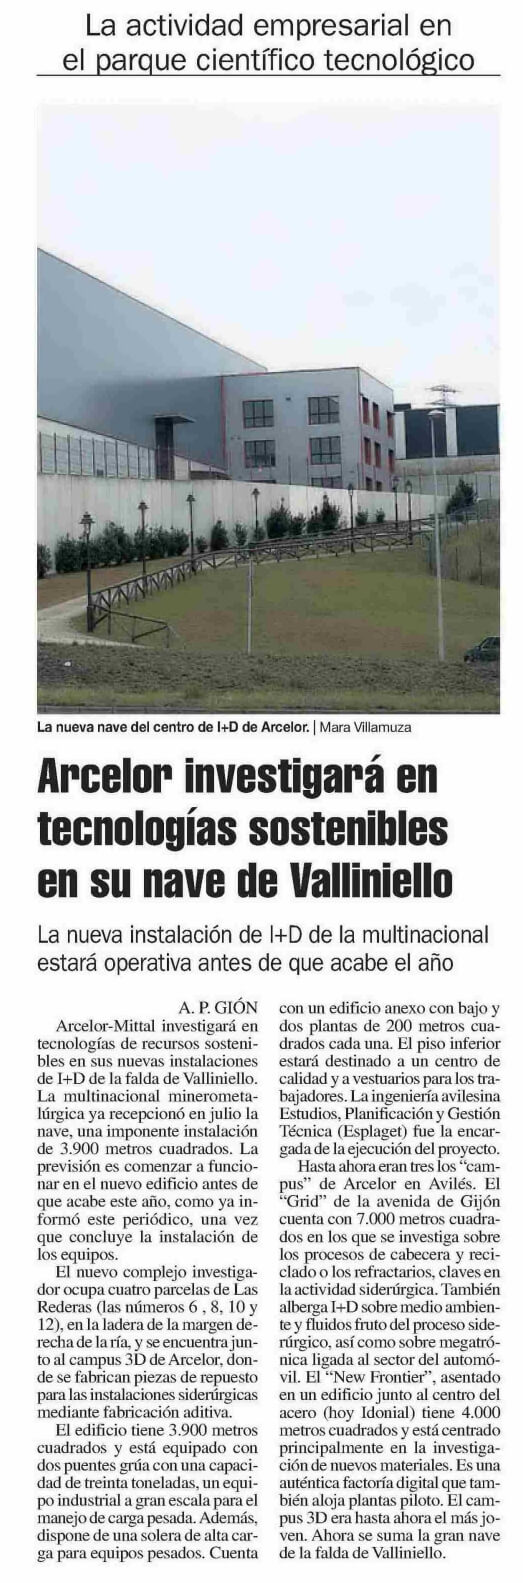 Arcelor investiga tecnologías sostenibles en Avilés